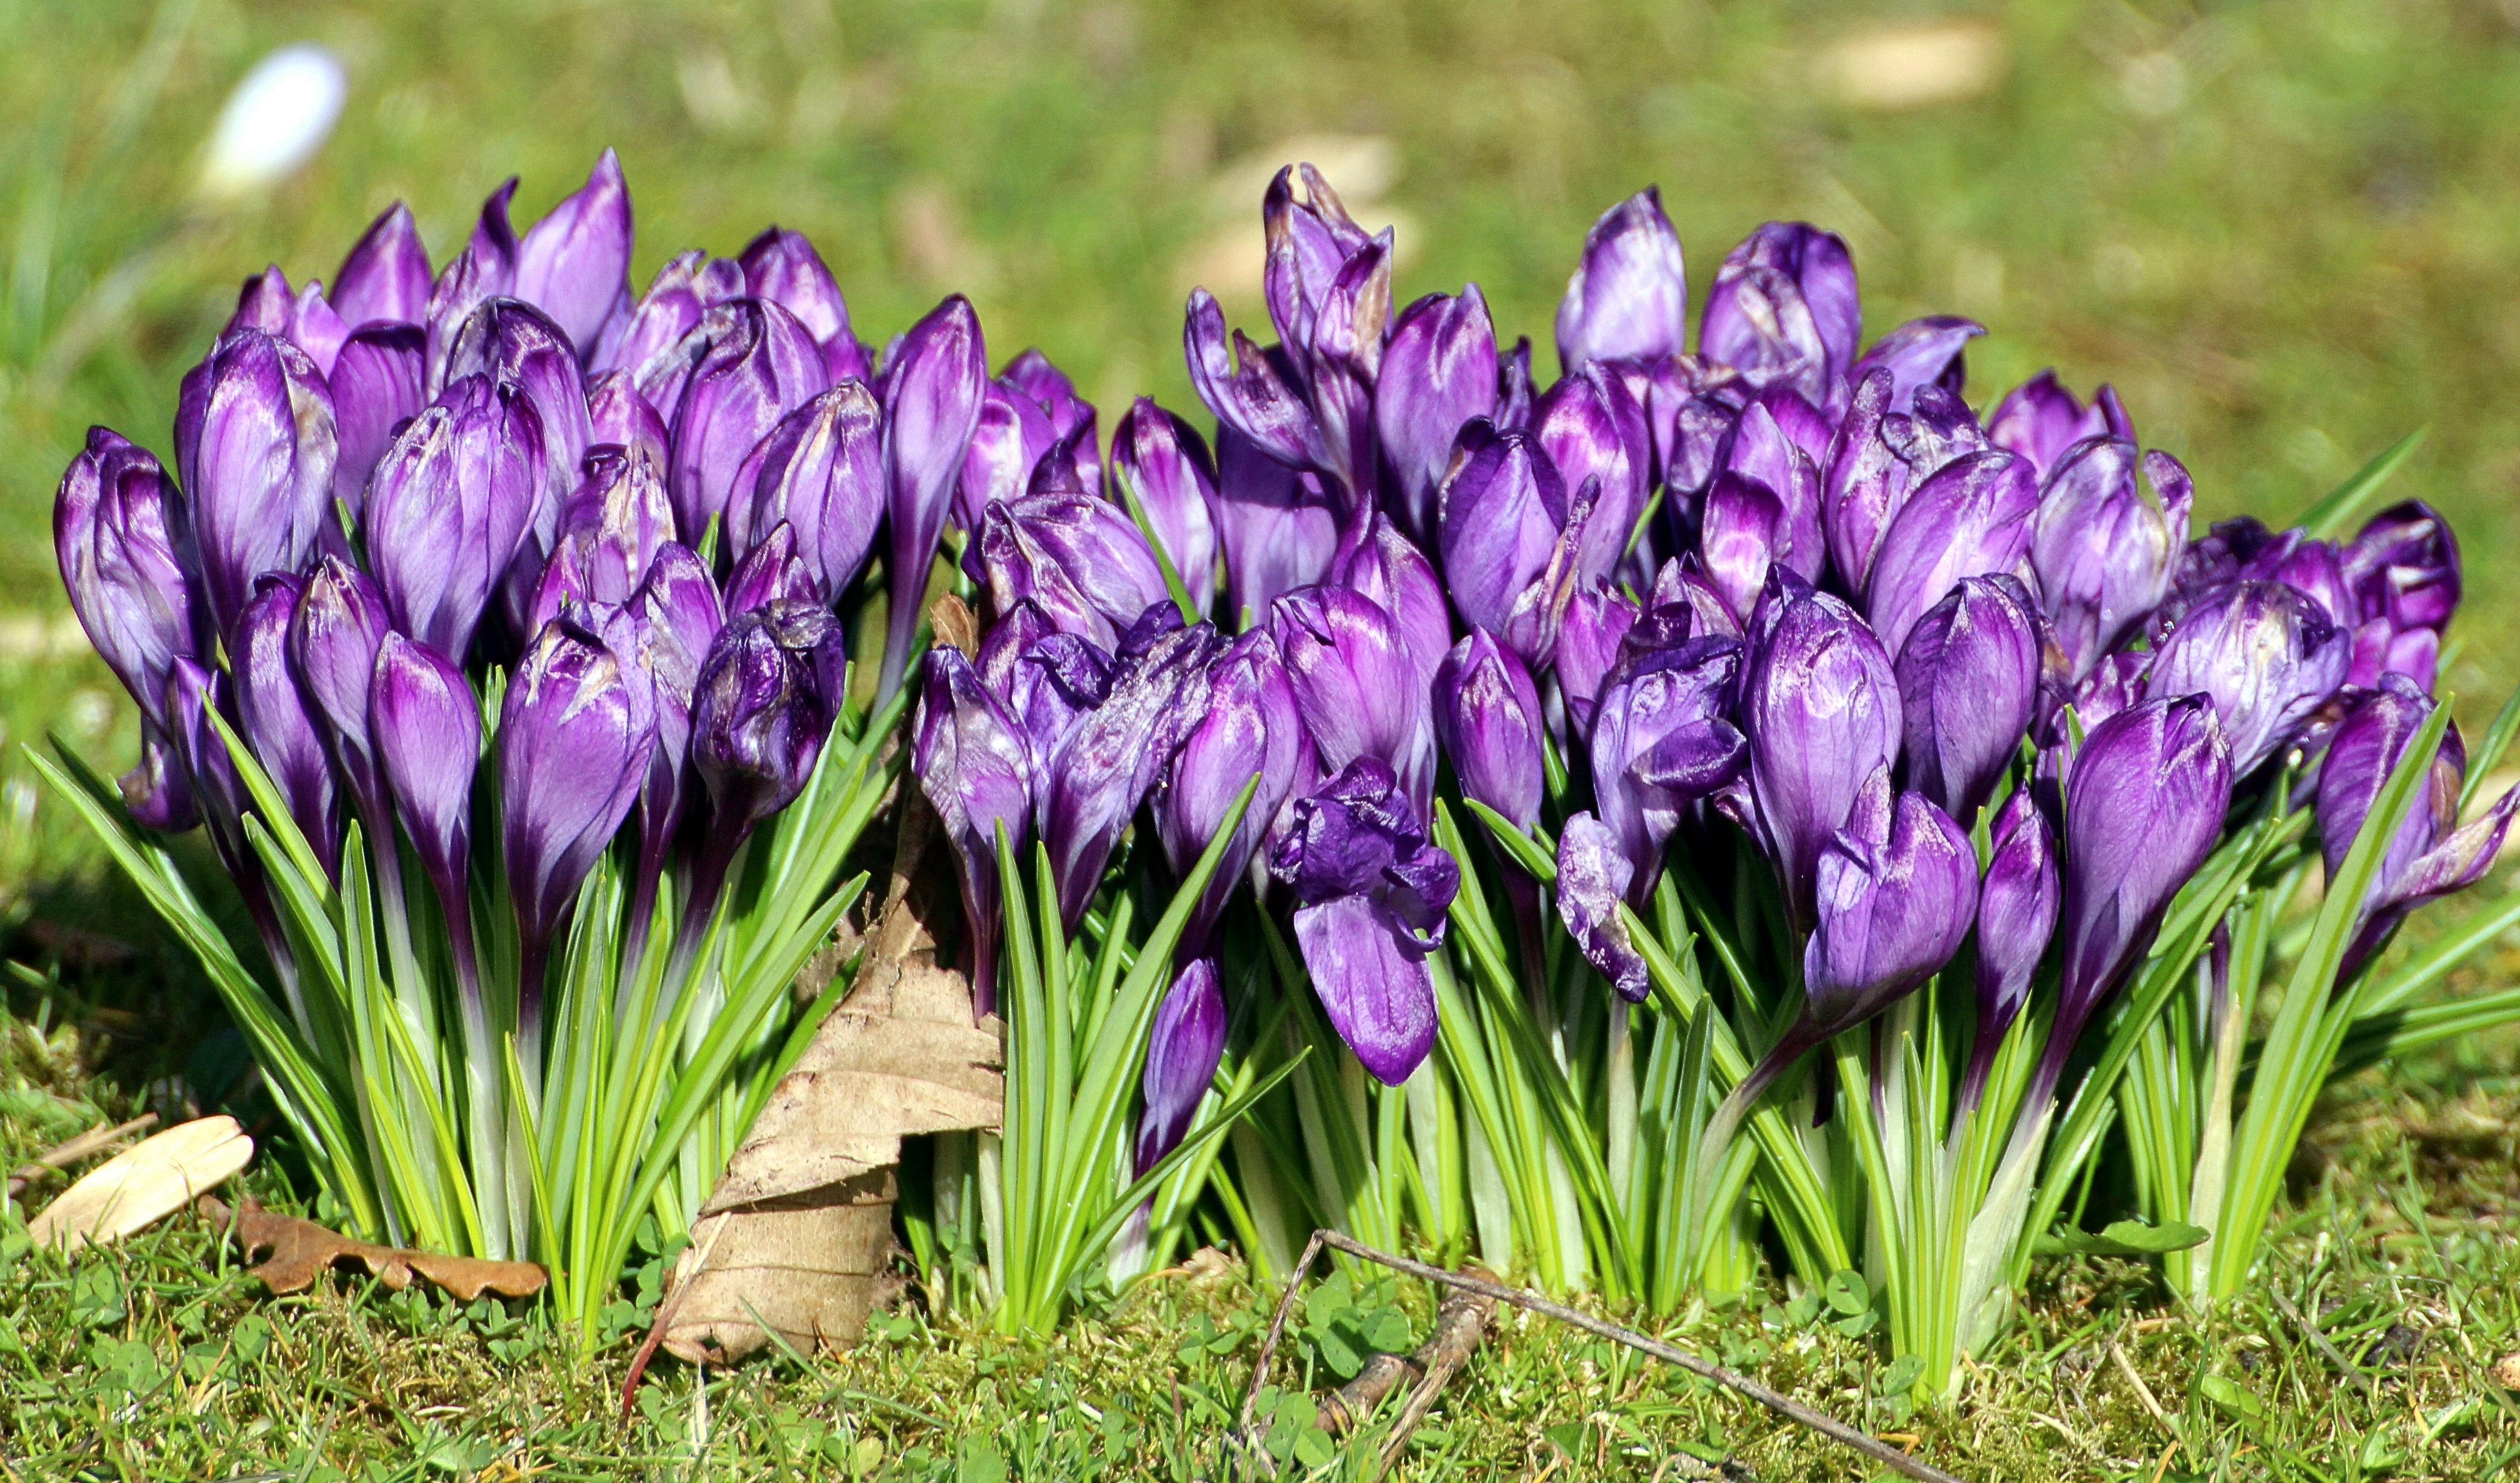 Free images nature flower purple bloom spring garden flowers nature plant flower purple bloom spring garden flowers iris crocus iridaceae hyacinth early bloomer ornamental plants mightylinksfo Gallery